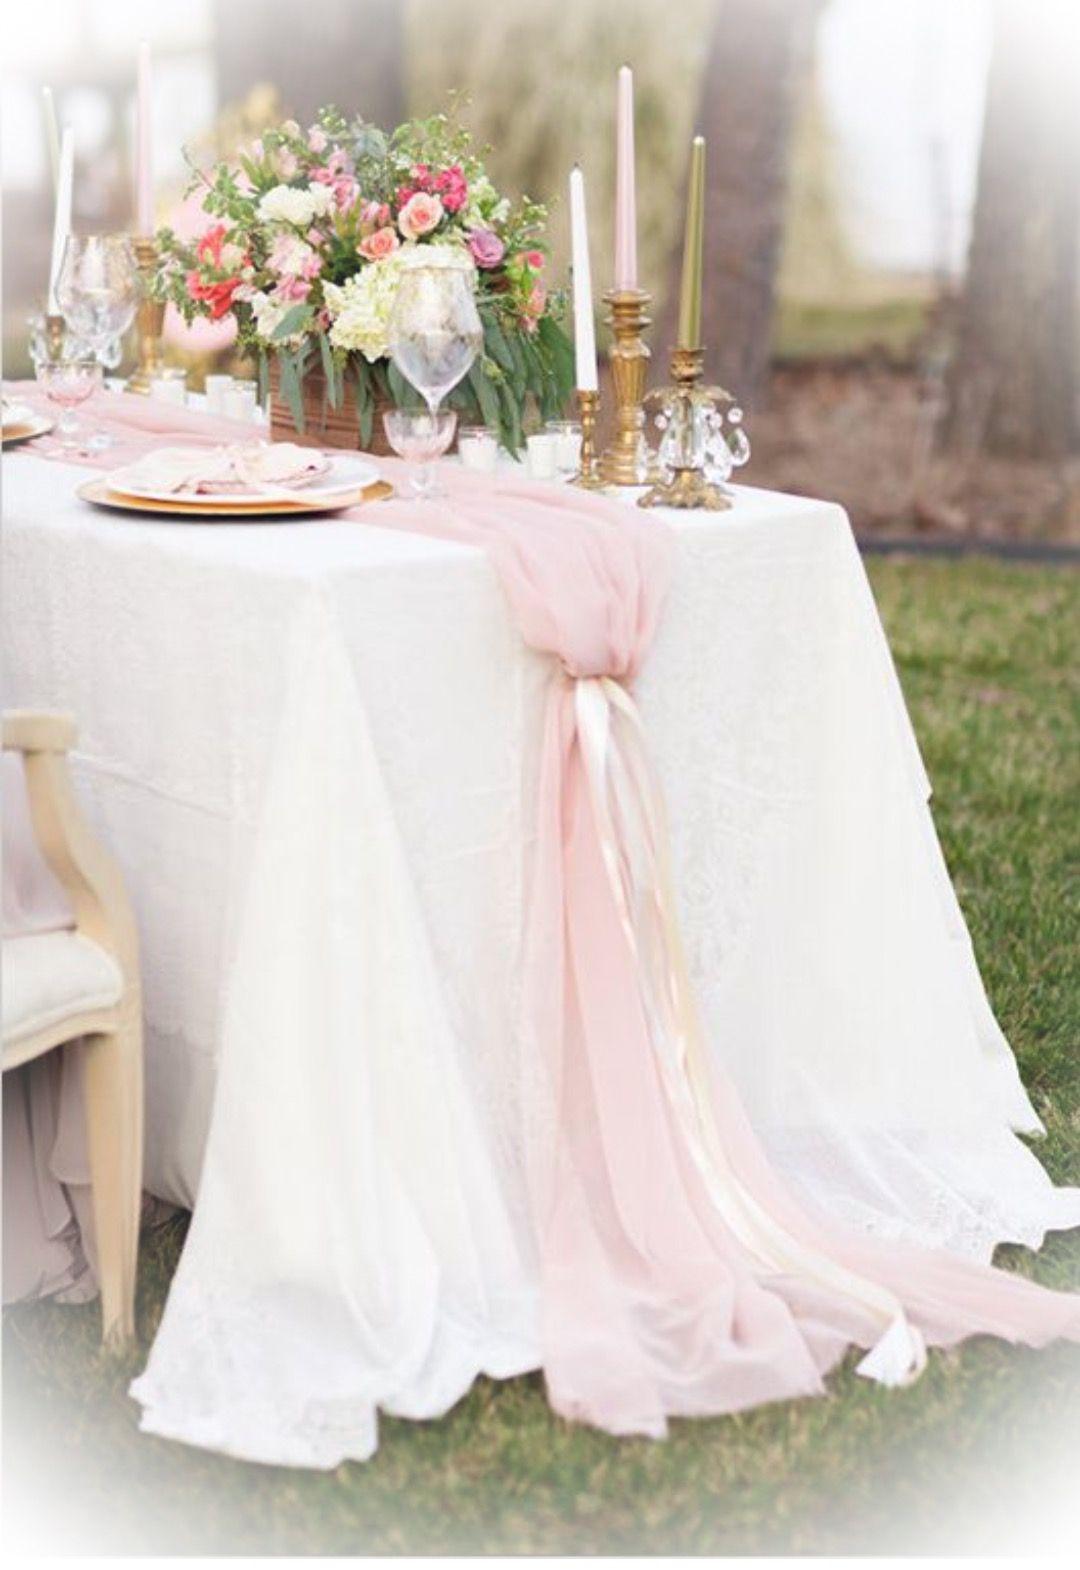 Pin by Amy Beth on Wedding: decorating Ideas | Pinterest | Tea ...